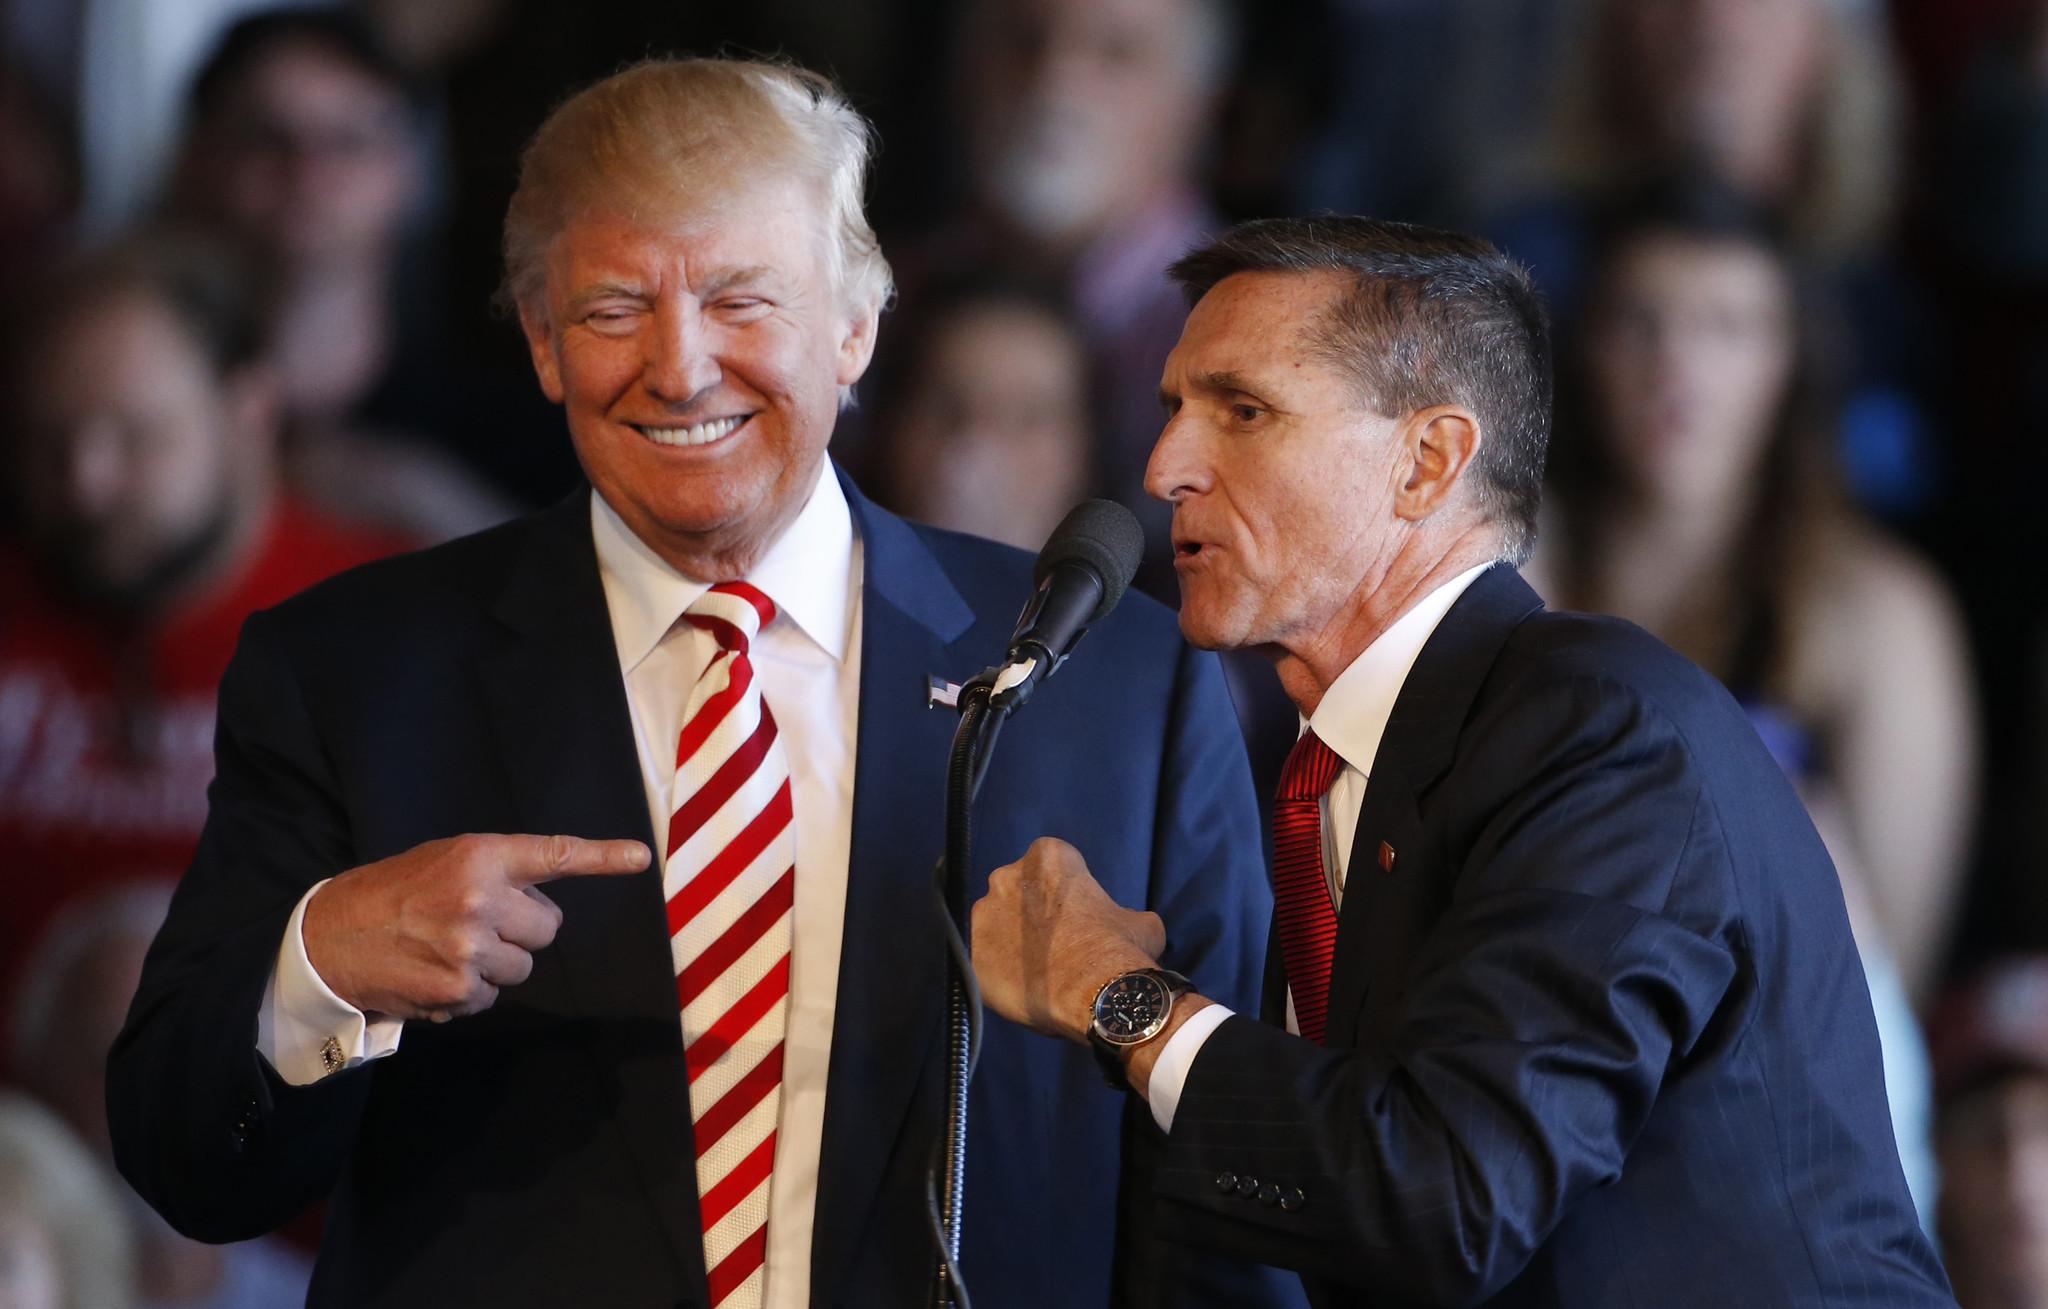 Trump says he'd 'certainly consider' rehiring Michael Flynn, pardoning his Russia probe guilty plea